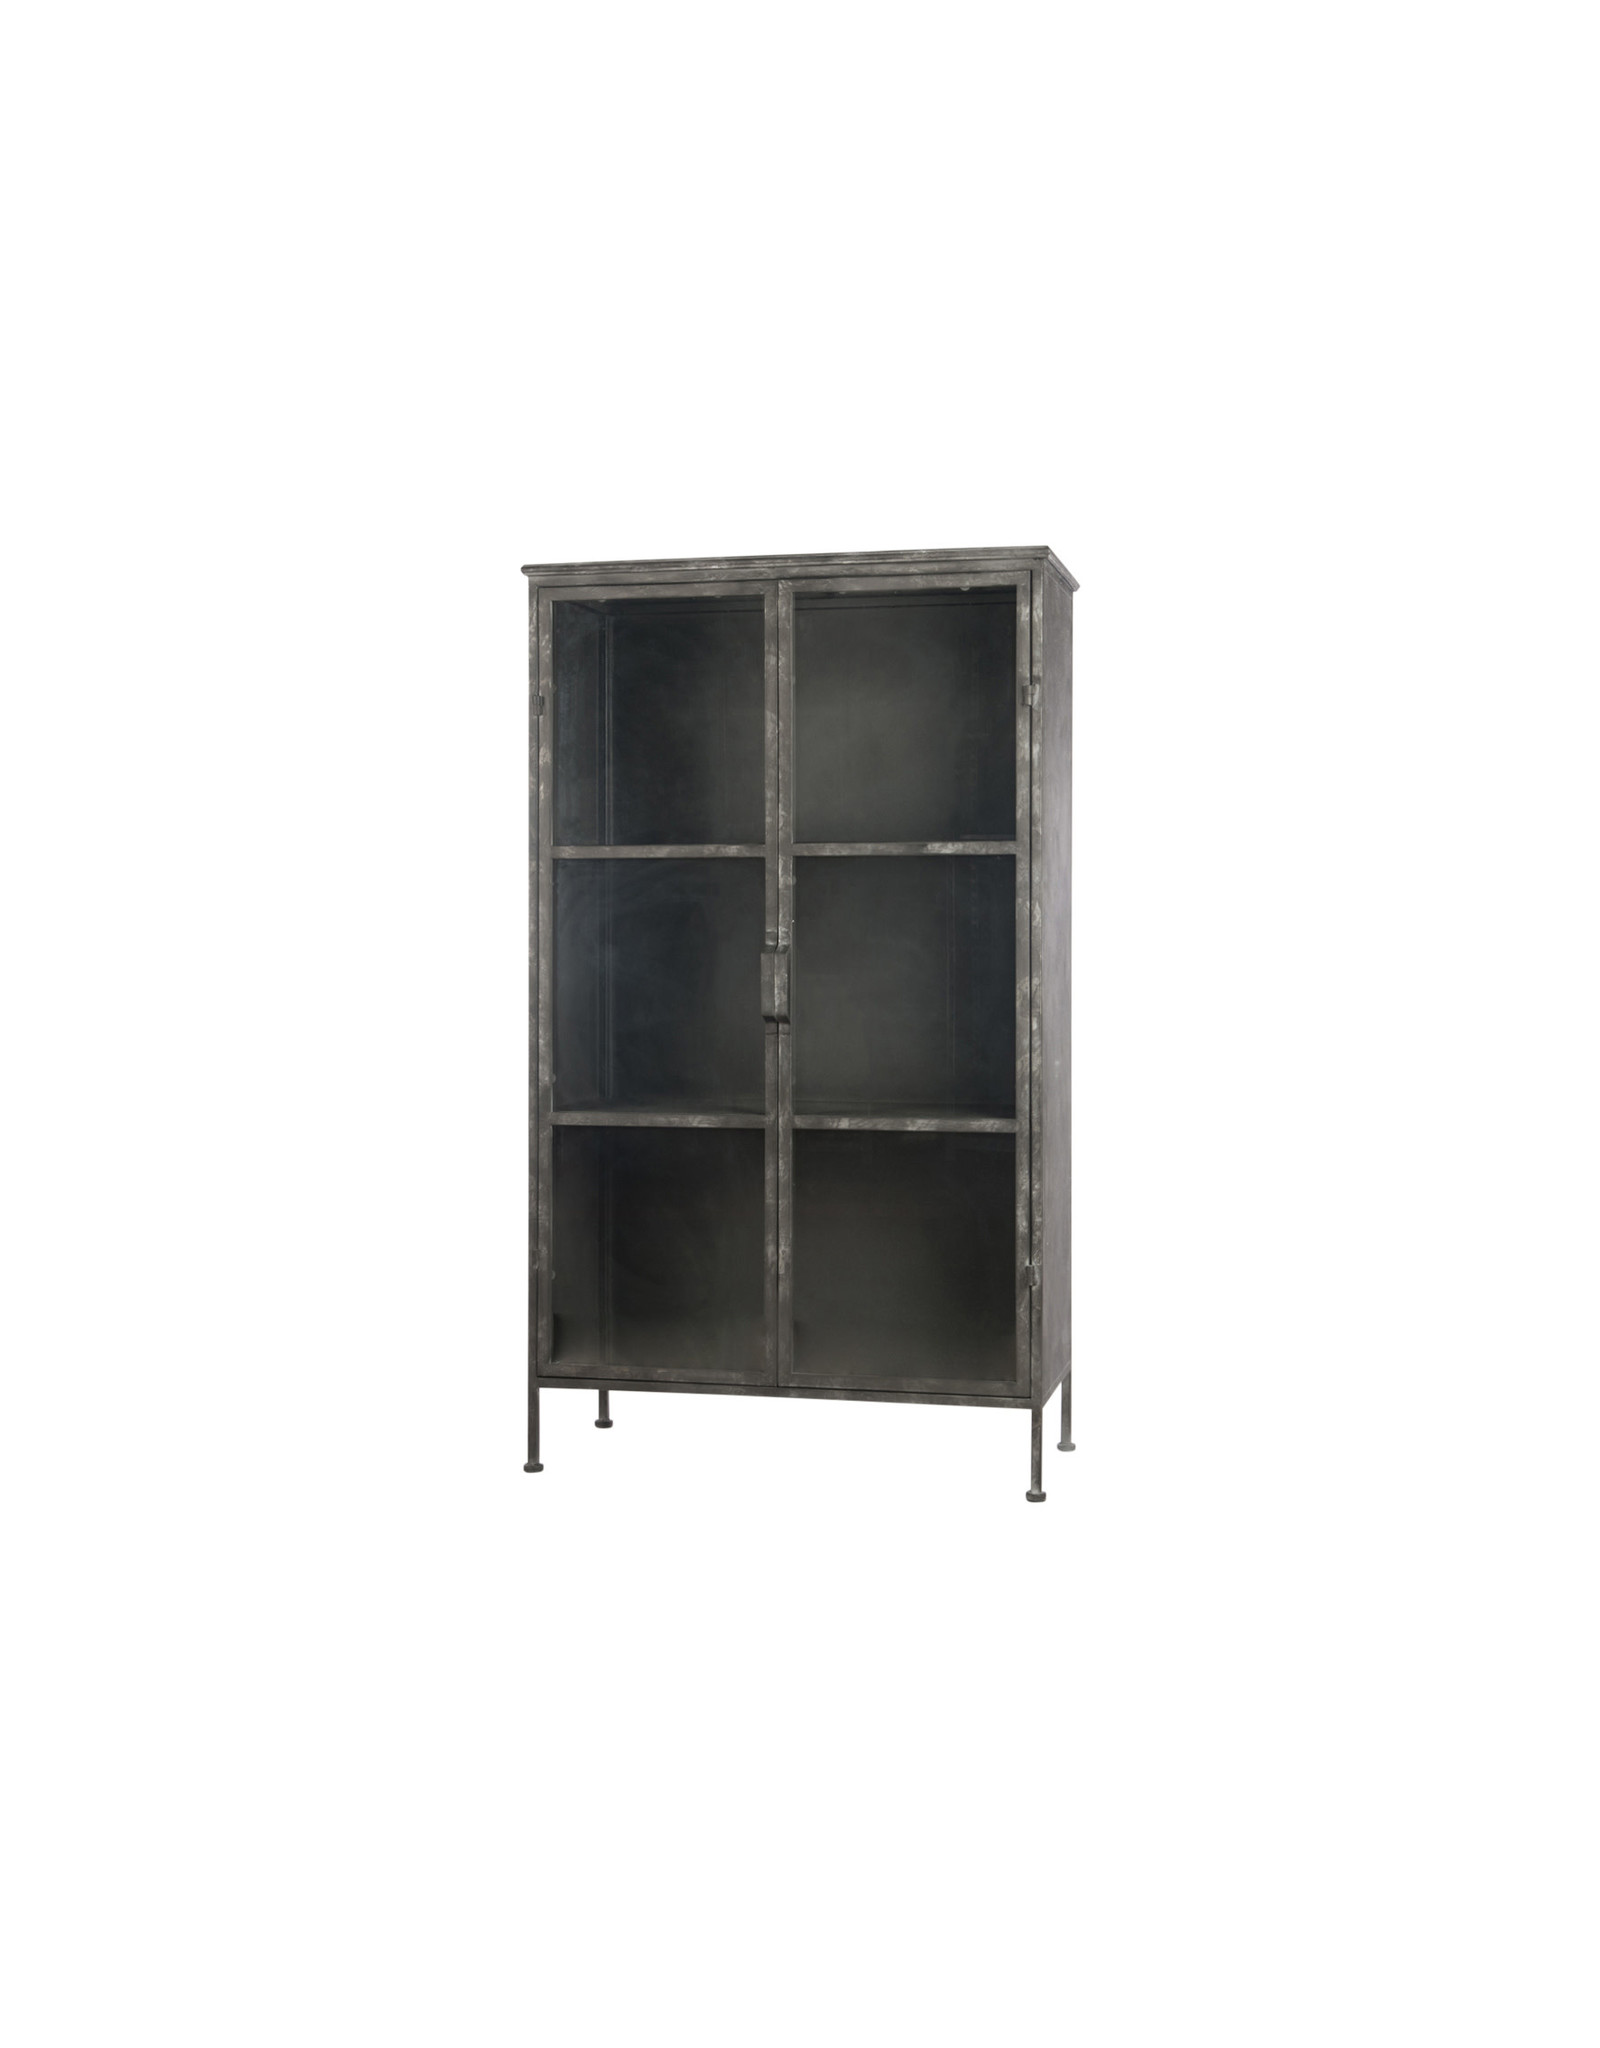 Dijk Cabinet metal antique black 82x37.5x142cm